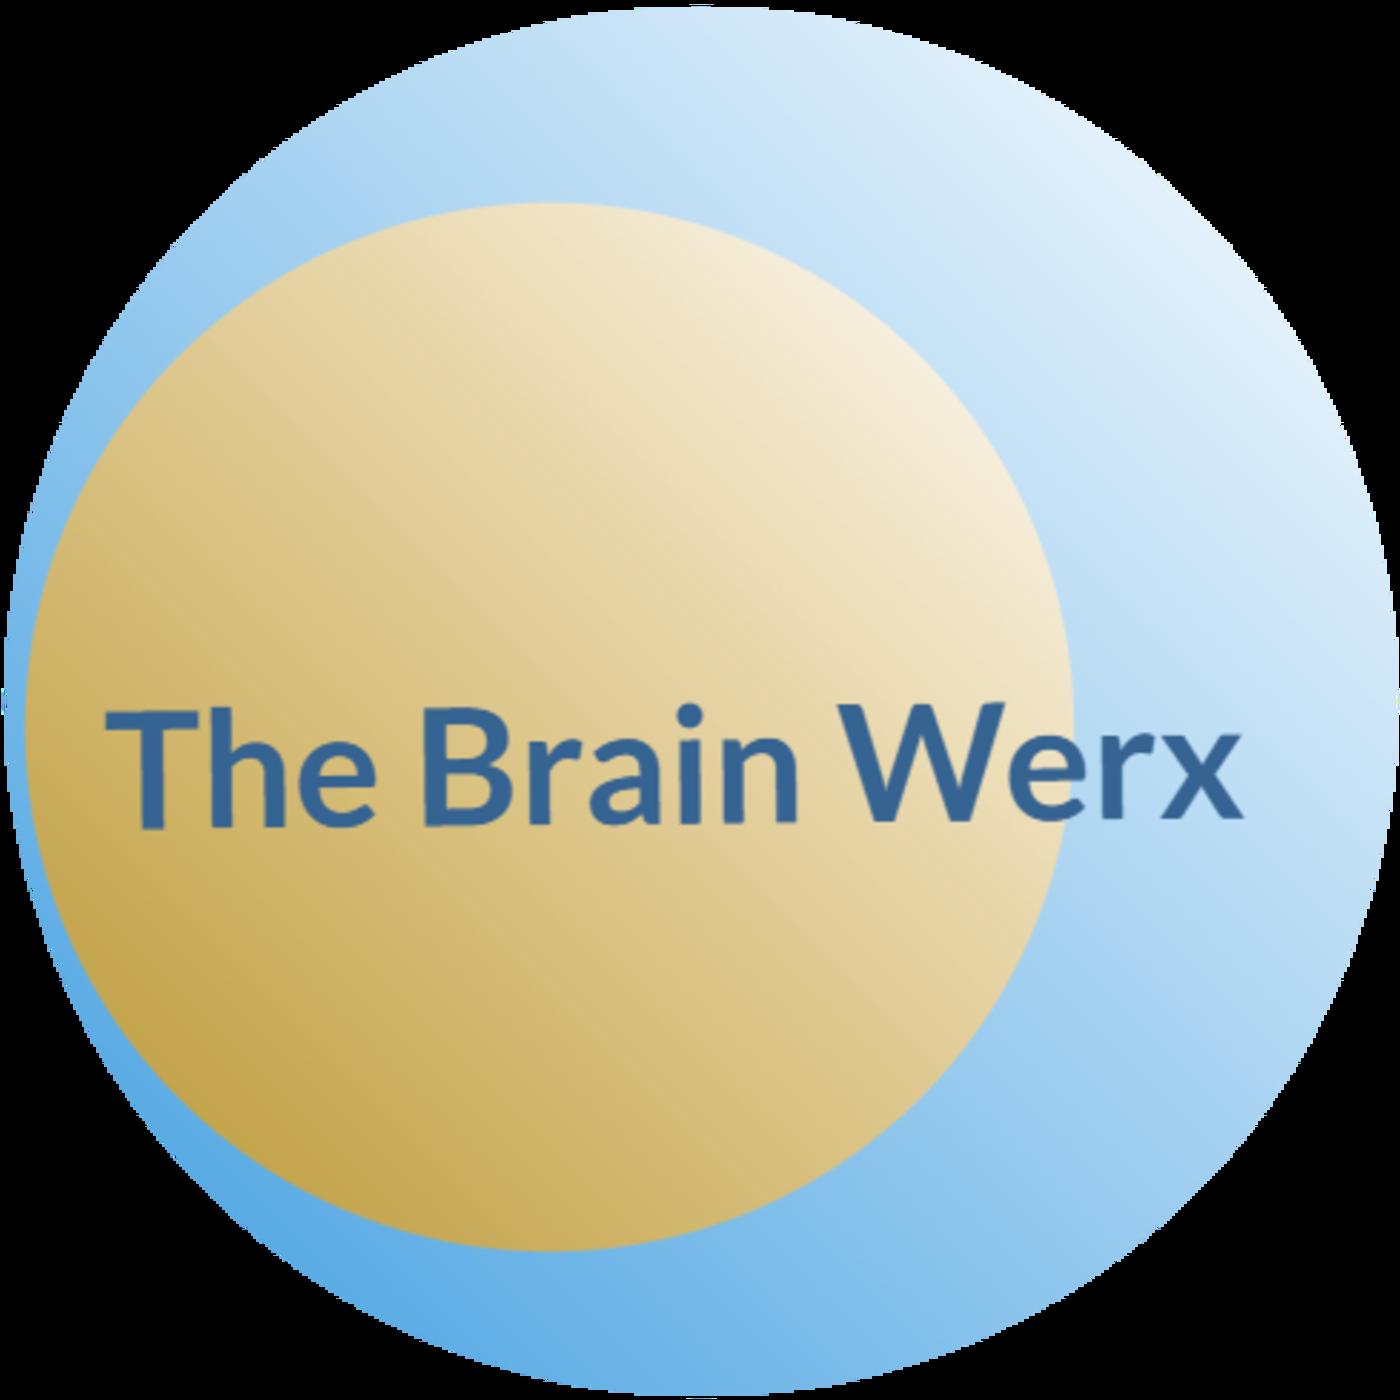 The Brain Werx